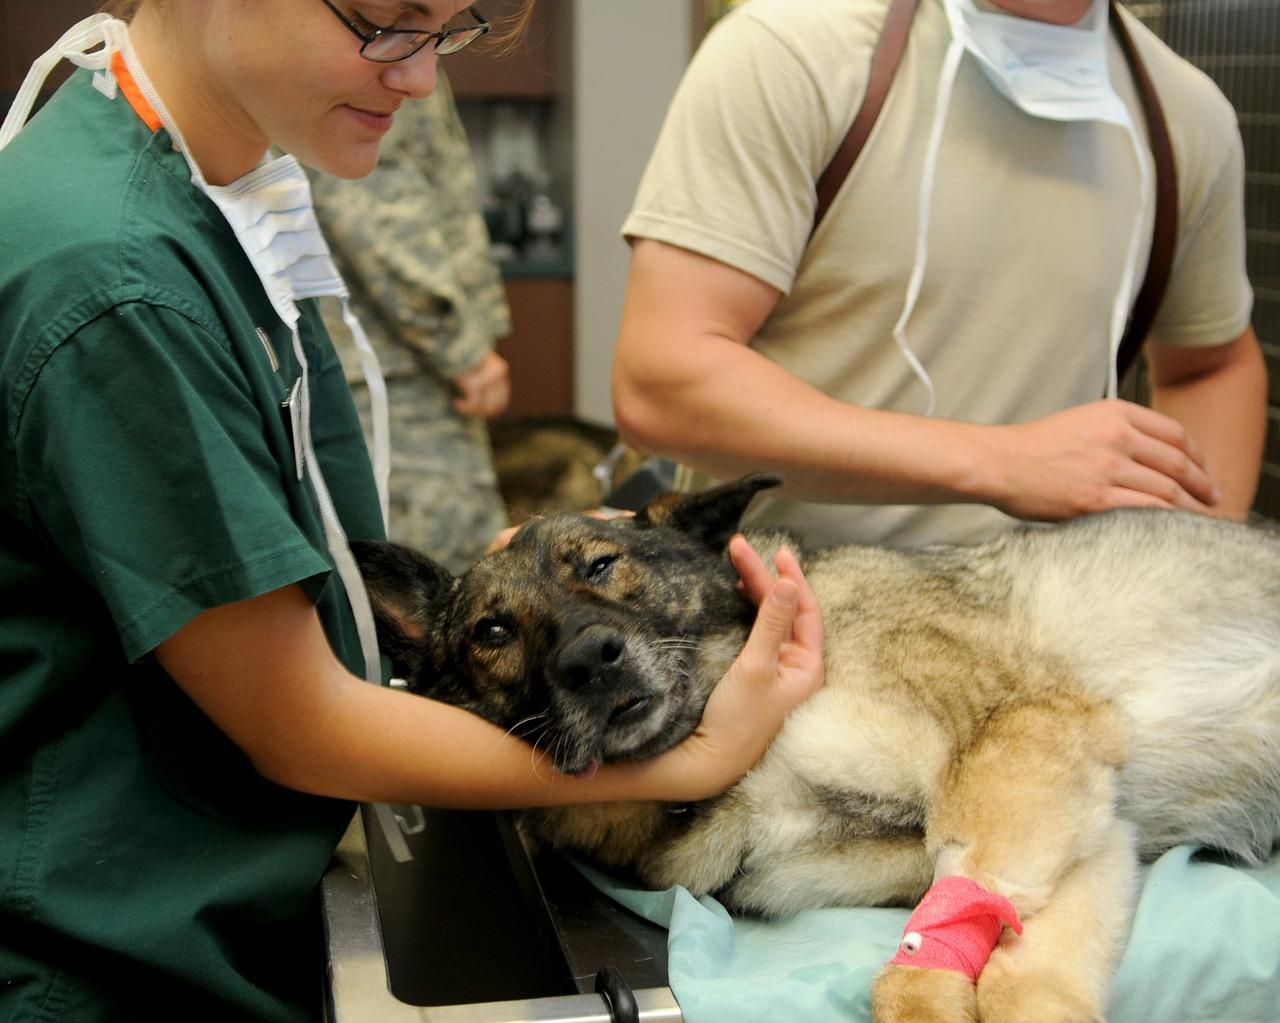 veterinary-hund-beim-arzt-85925_1280